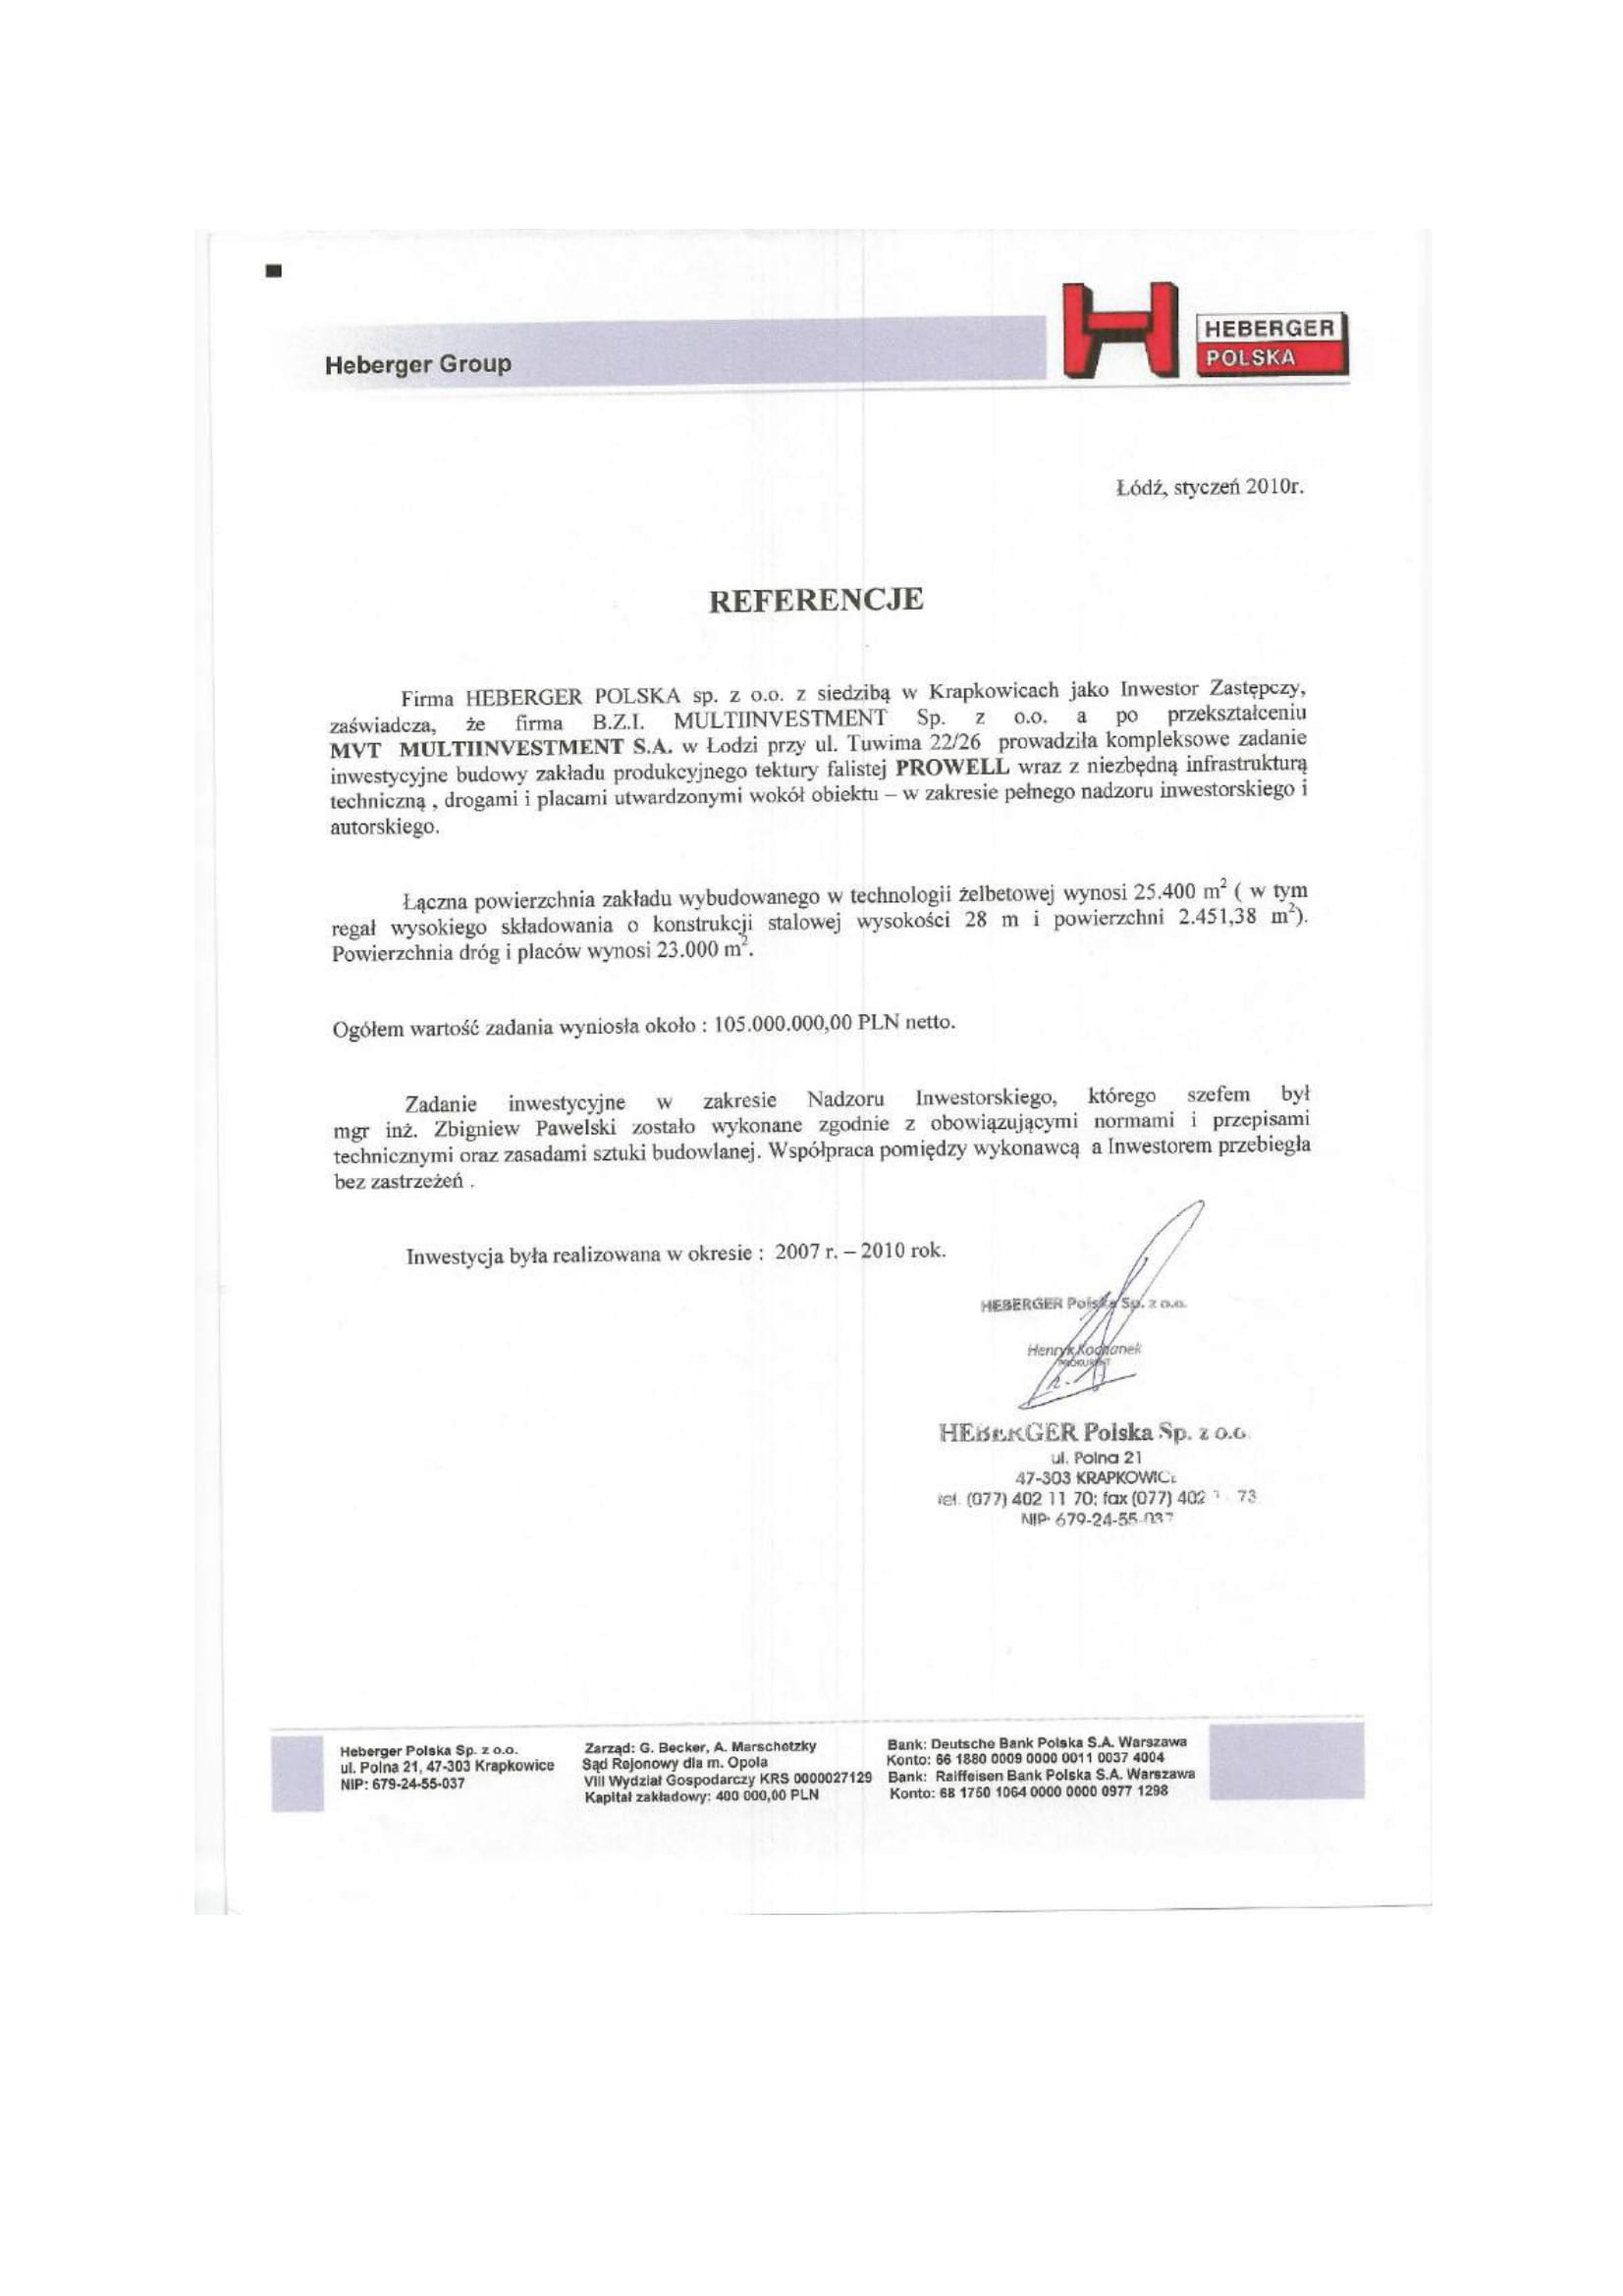 Referencje_mvt_heberger_polska